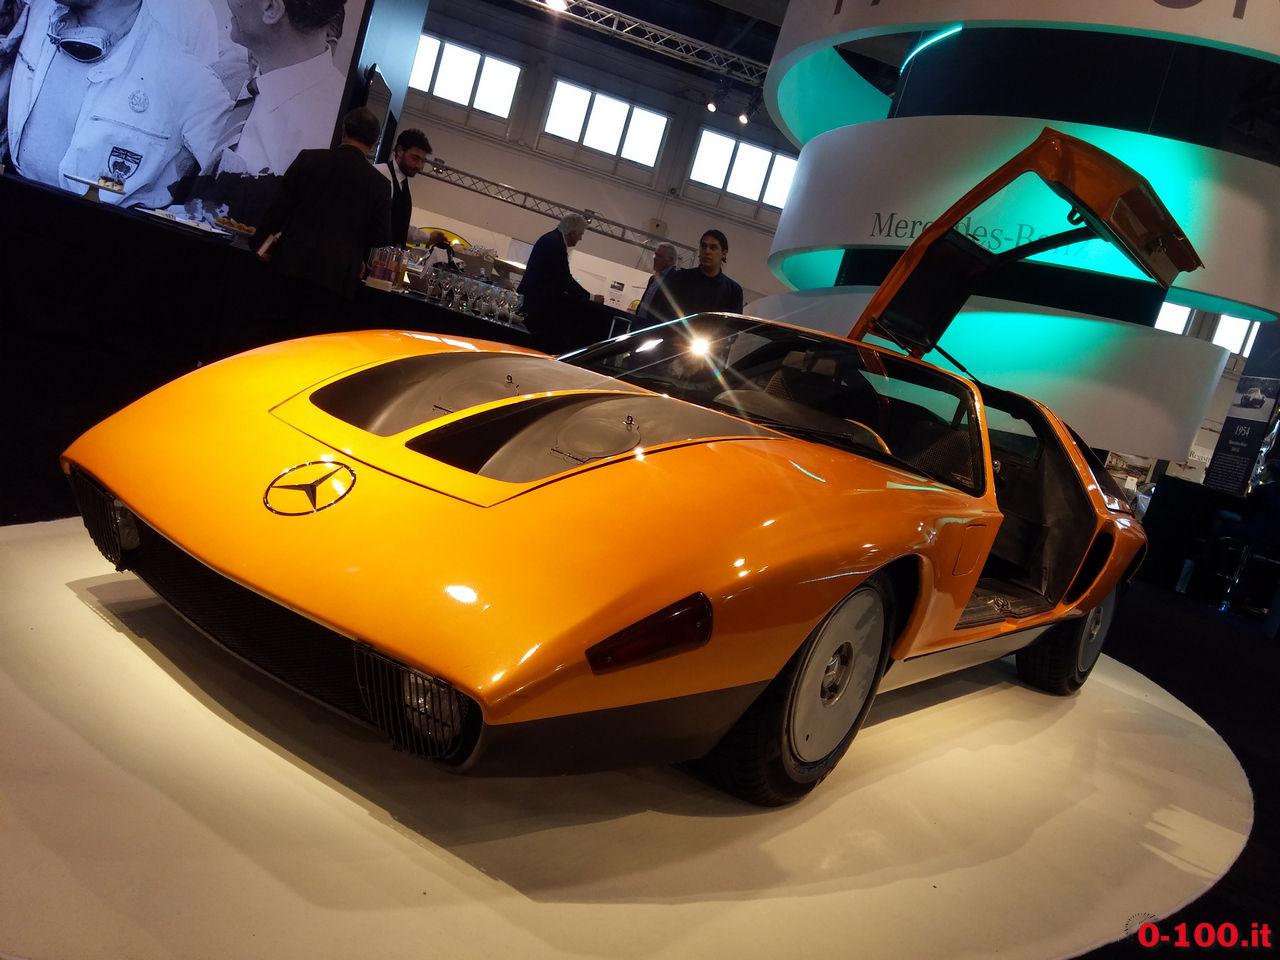 automotodepoca-2016-mercedes-sc111-car-market-mercato-auto-prezzo-price_0-10016